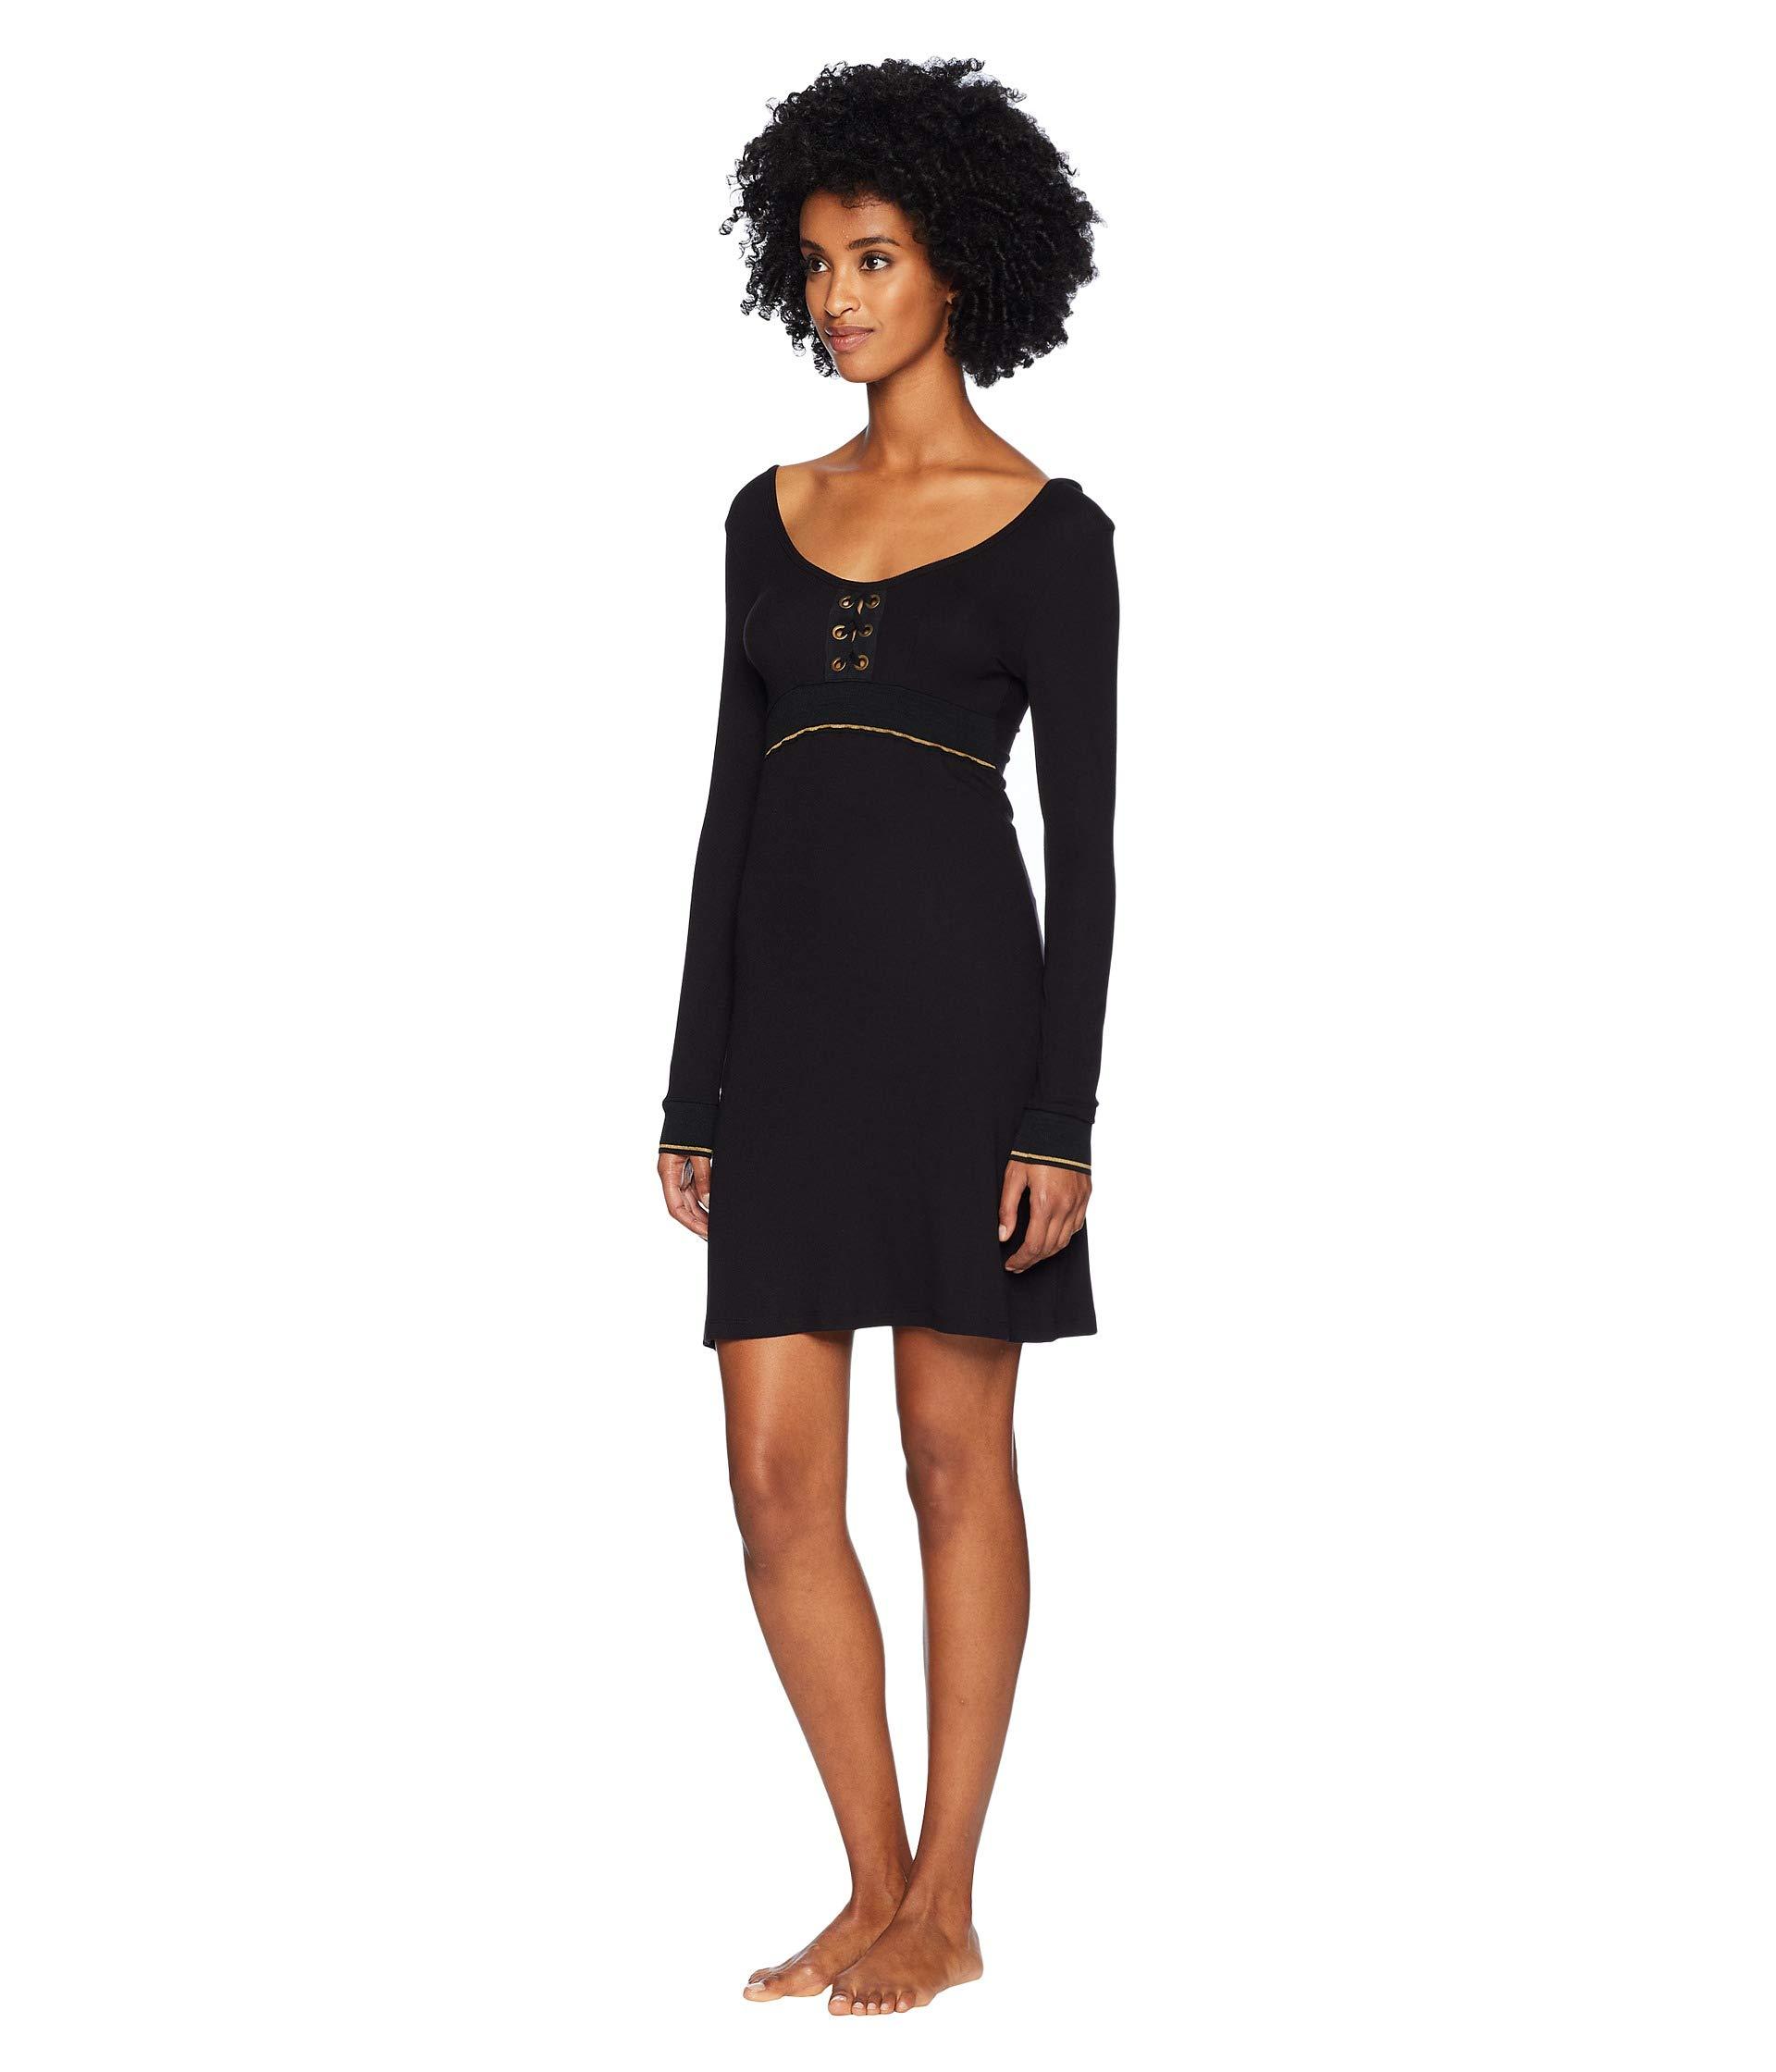 Lace Black Lounge Else Dress Sleeved Urban Long up Oqn8UT